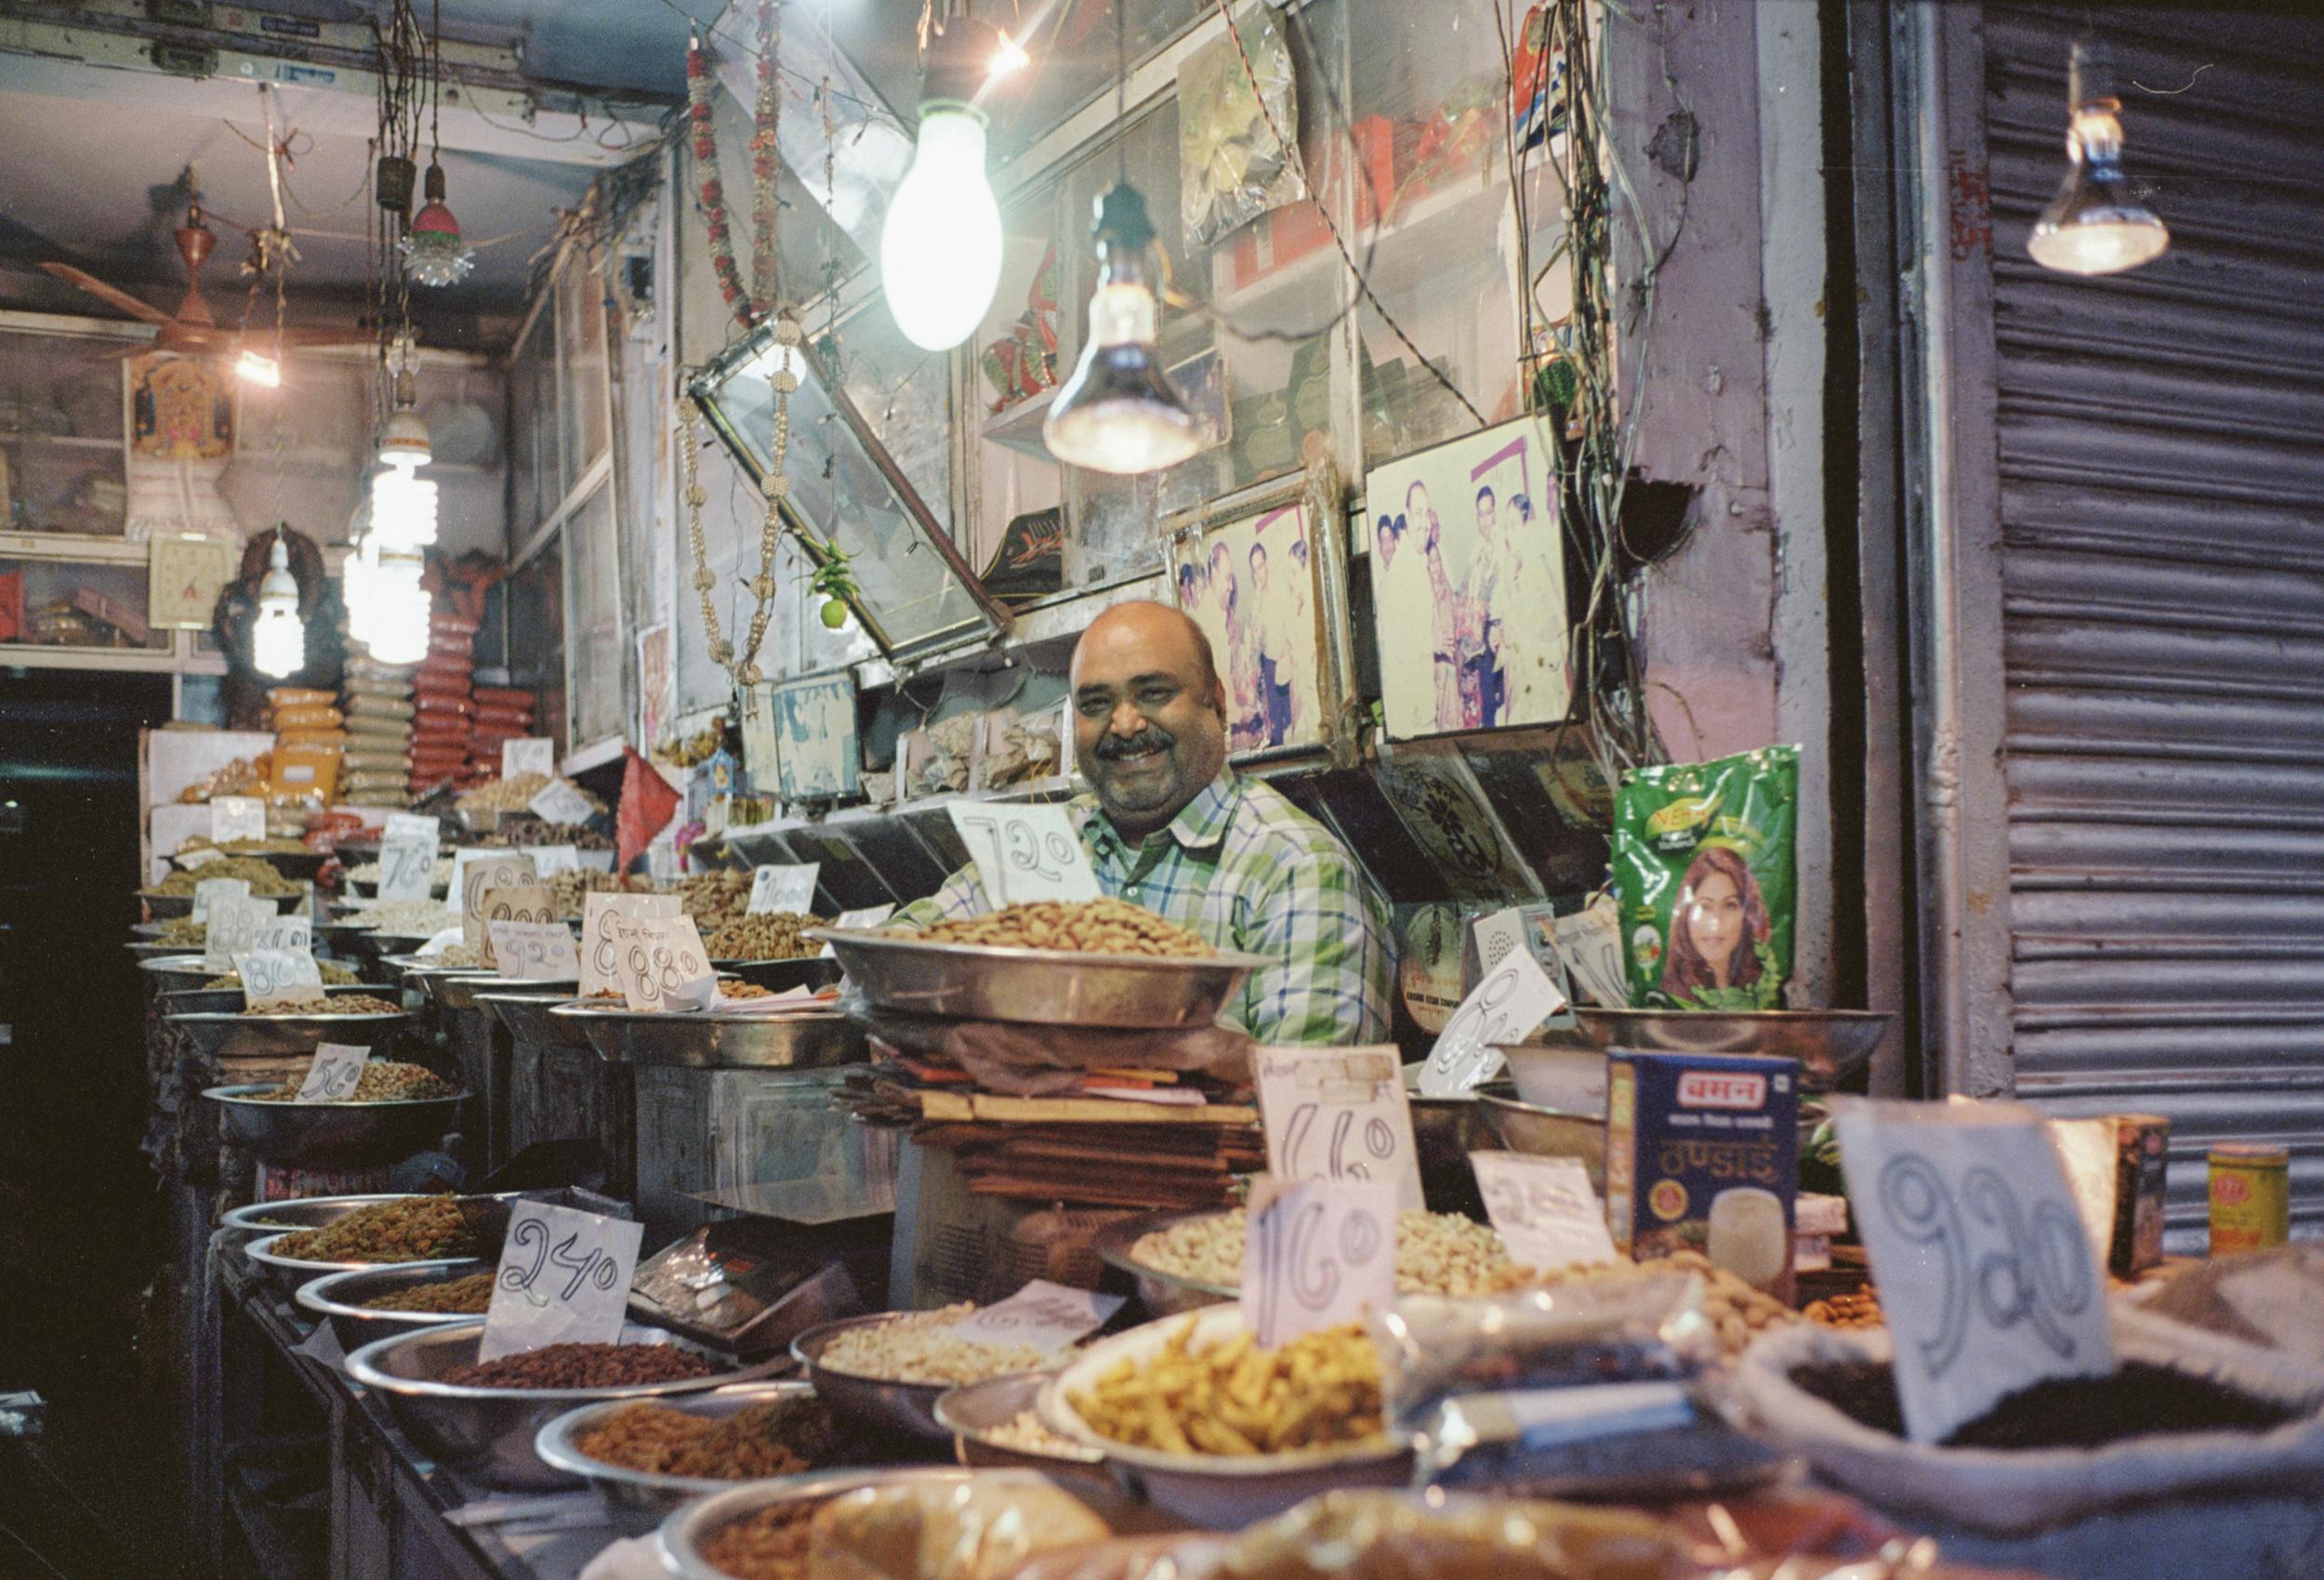 72-F23_Spice Market, Delhi, India 2016-11.jpg